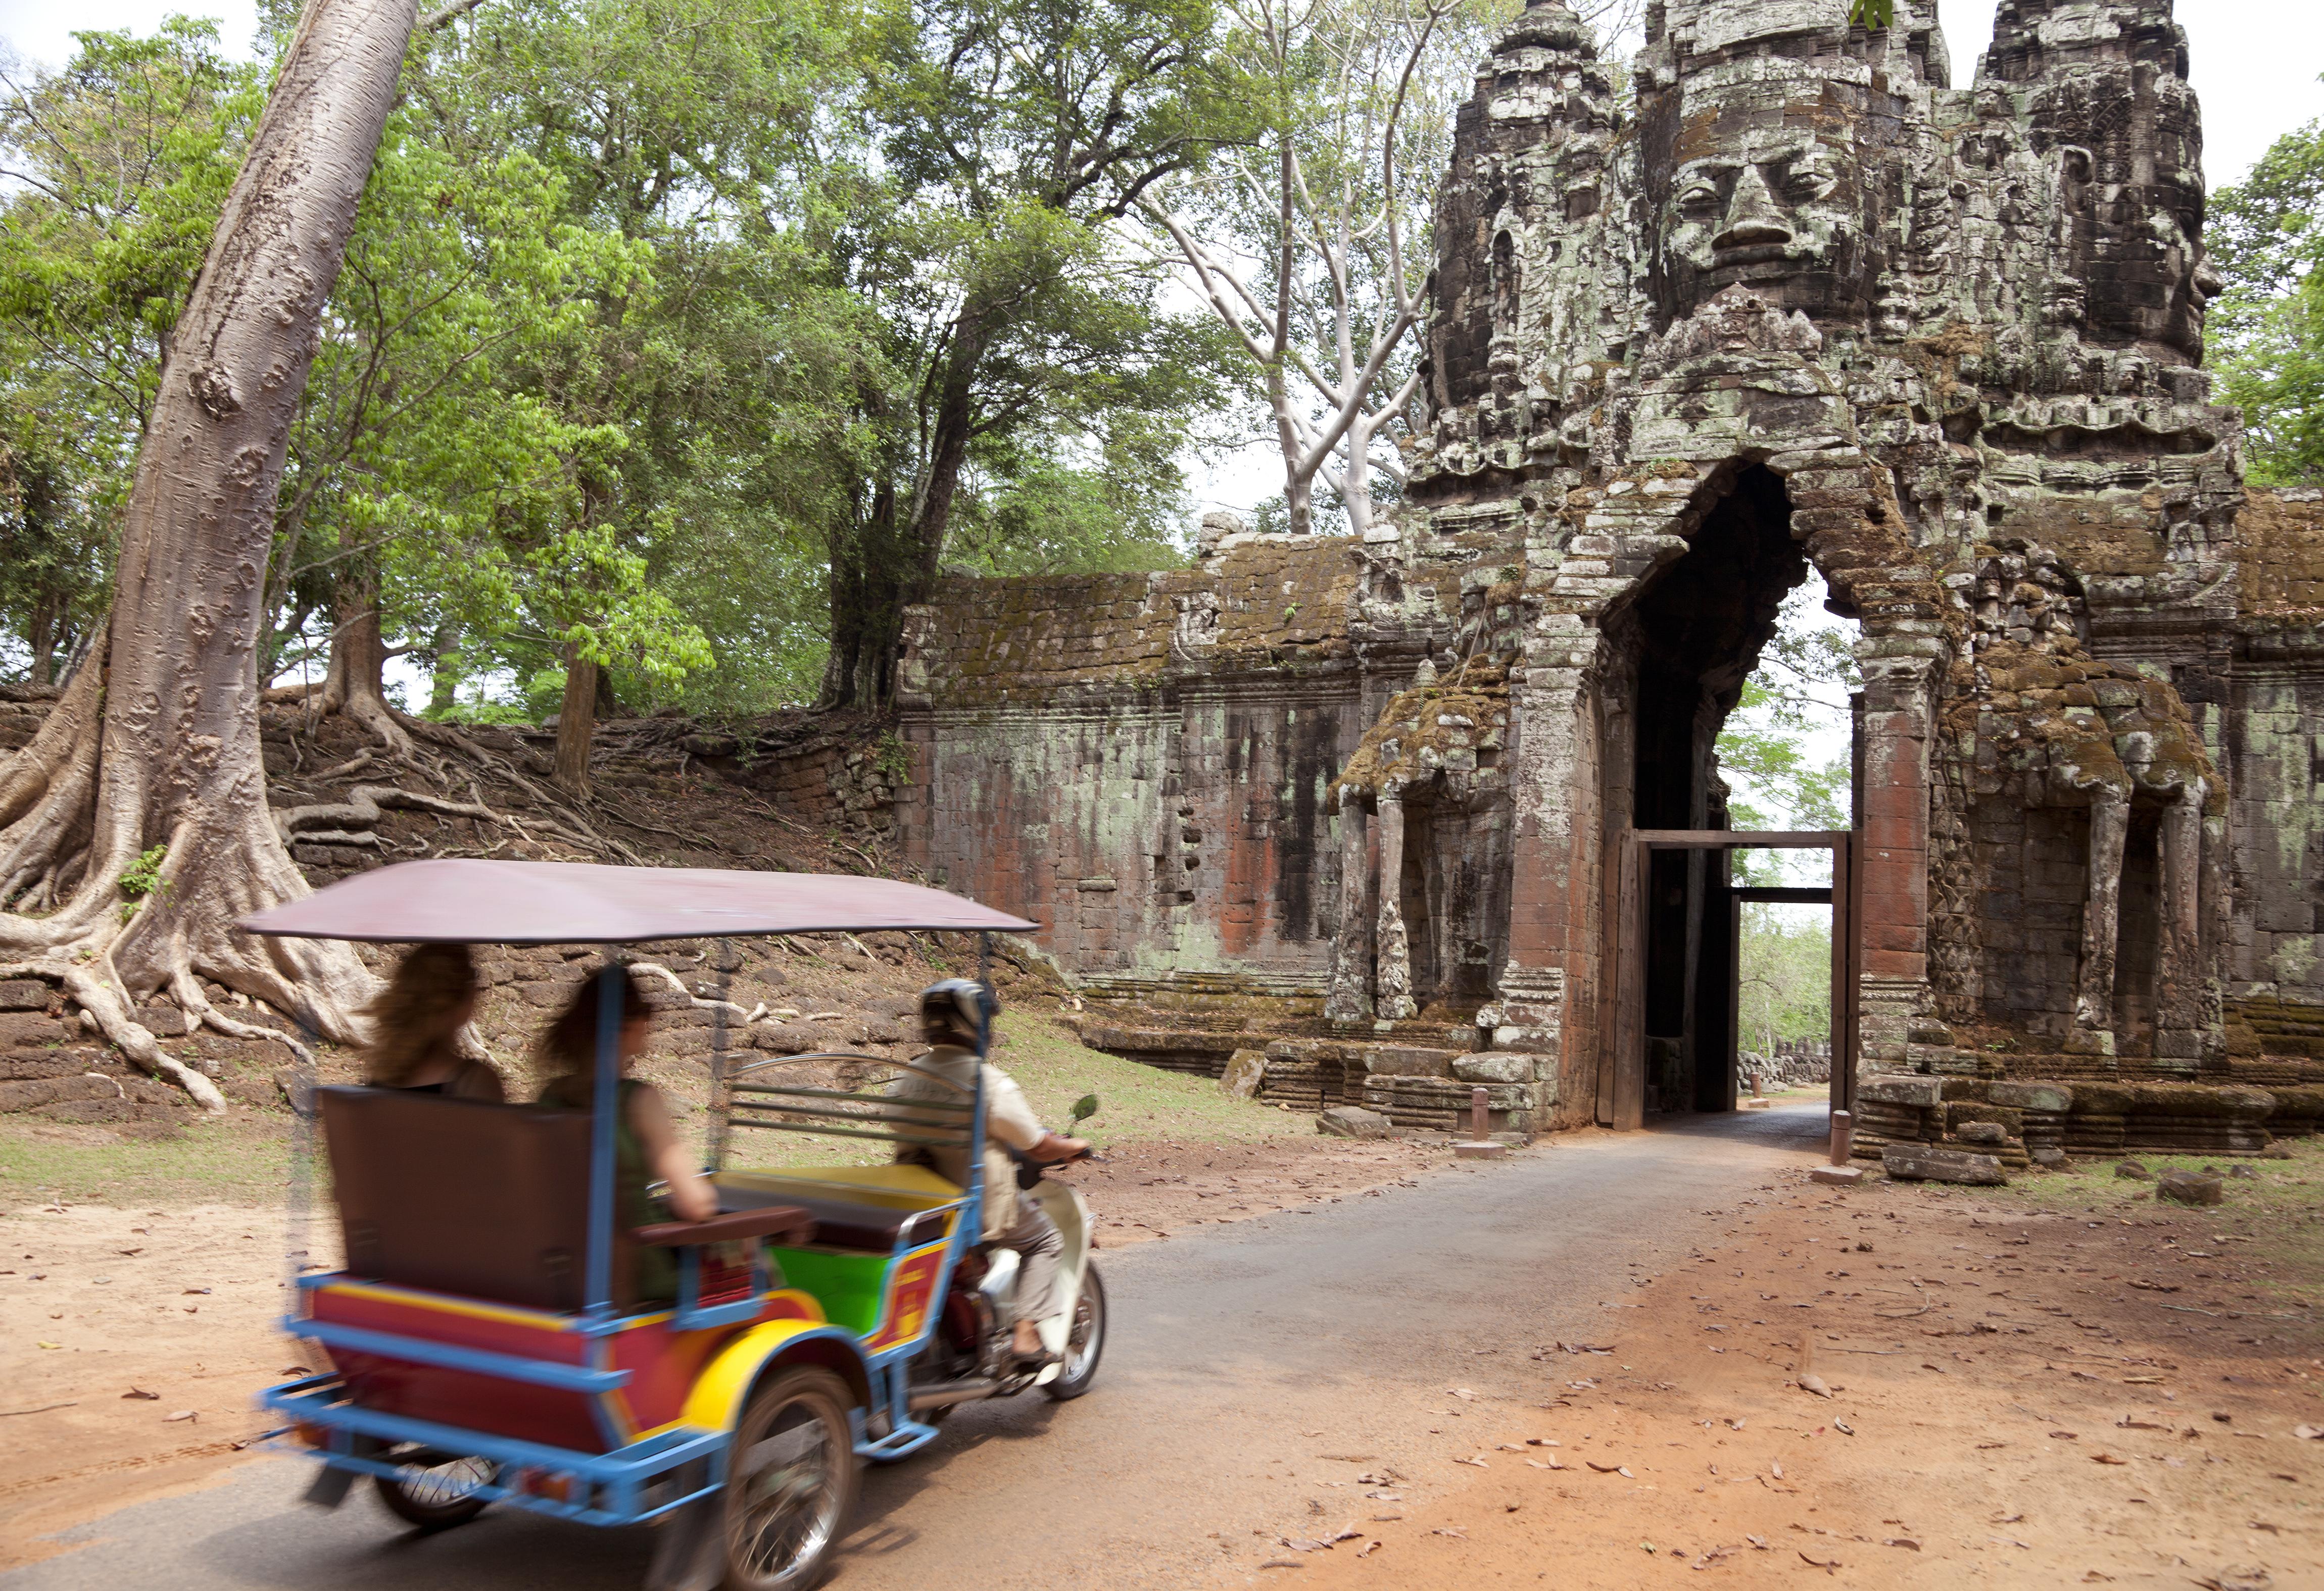 Kambodscha Individualreise -Aktivreise Vietnam Kambodscha -TukTuk Fahrt durch die Tempelanlage - Angkor Wat